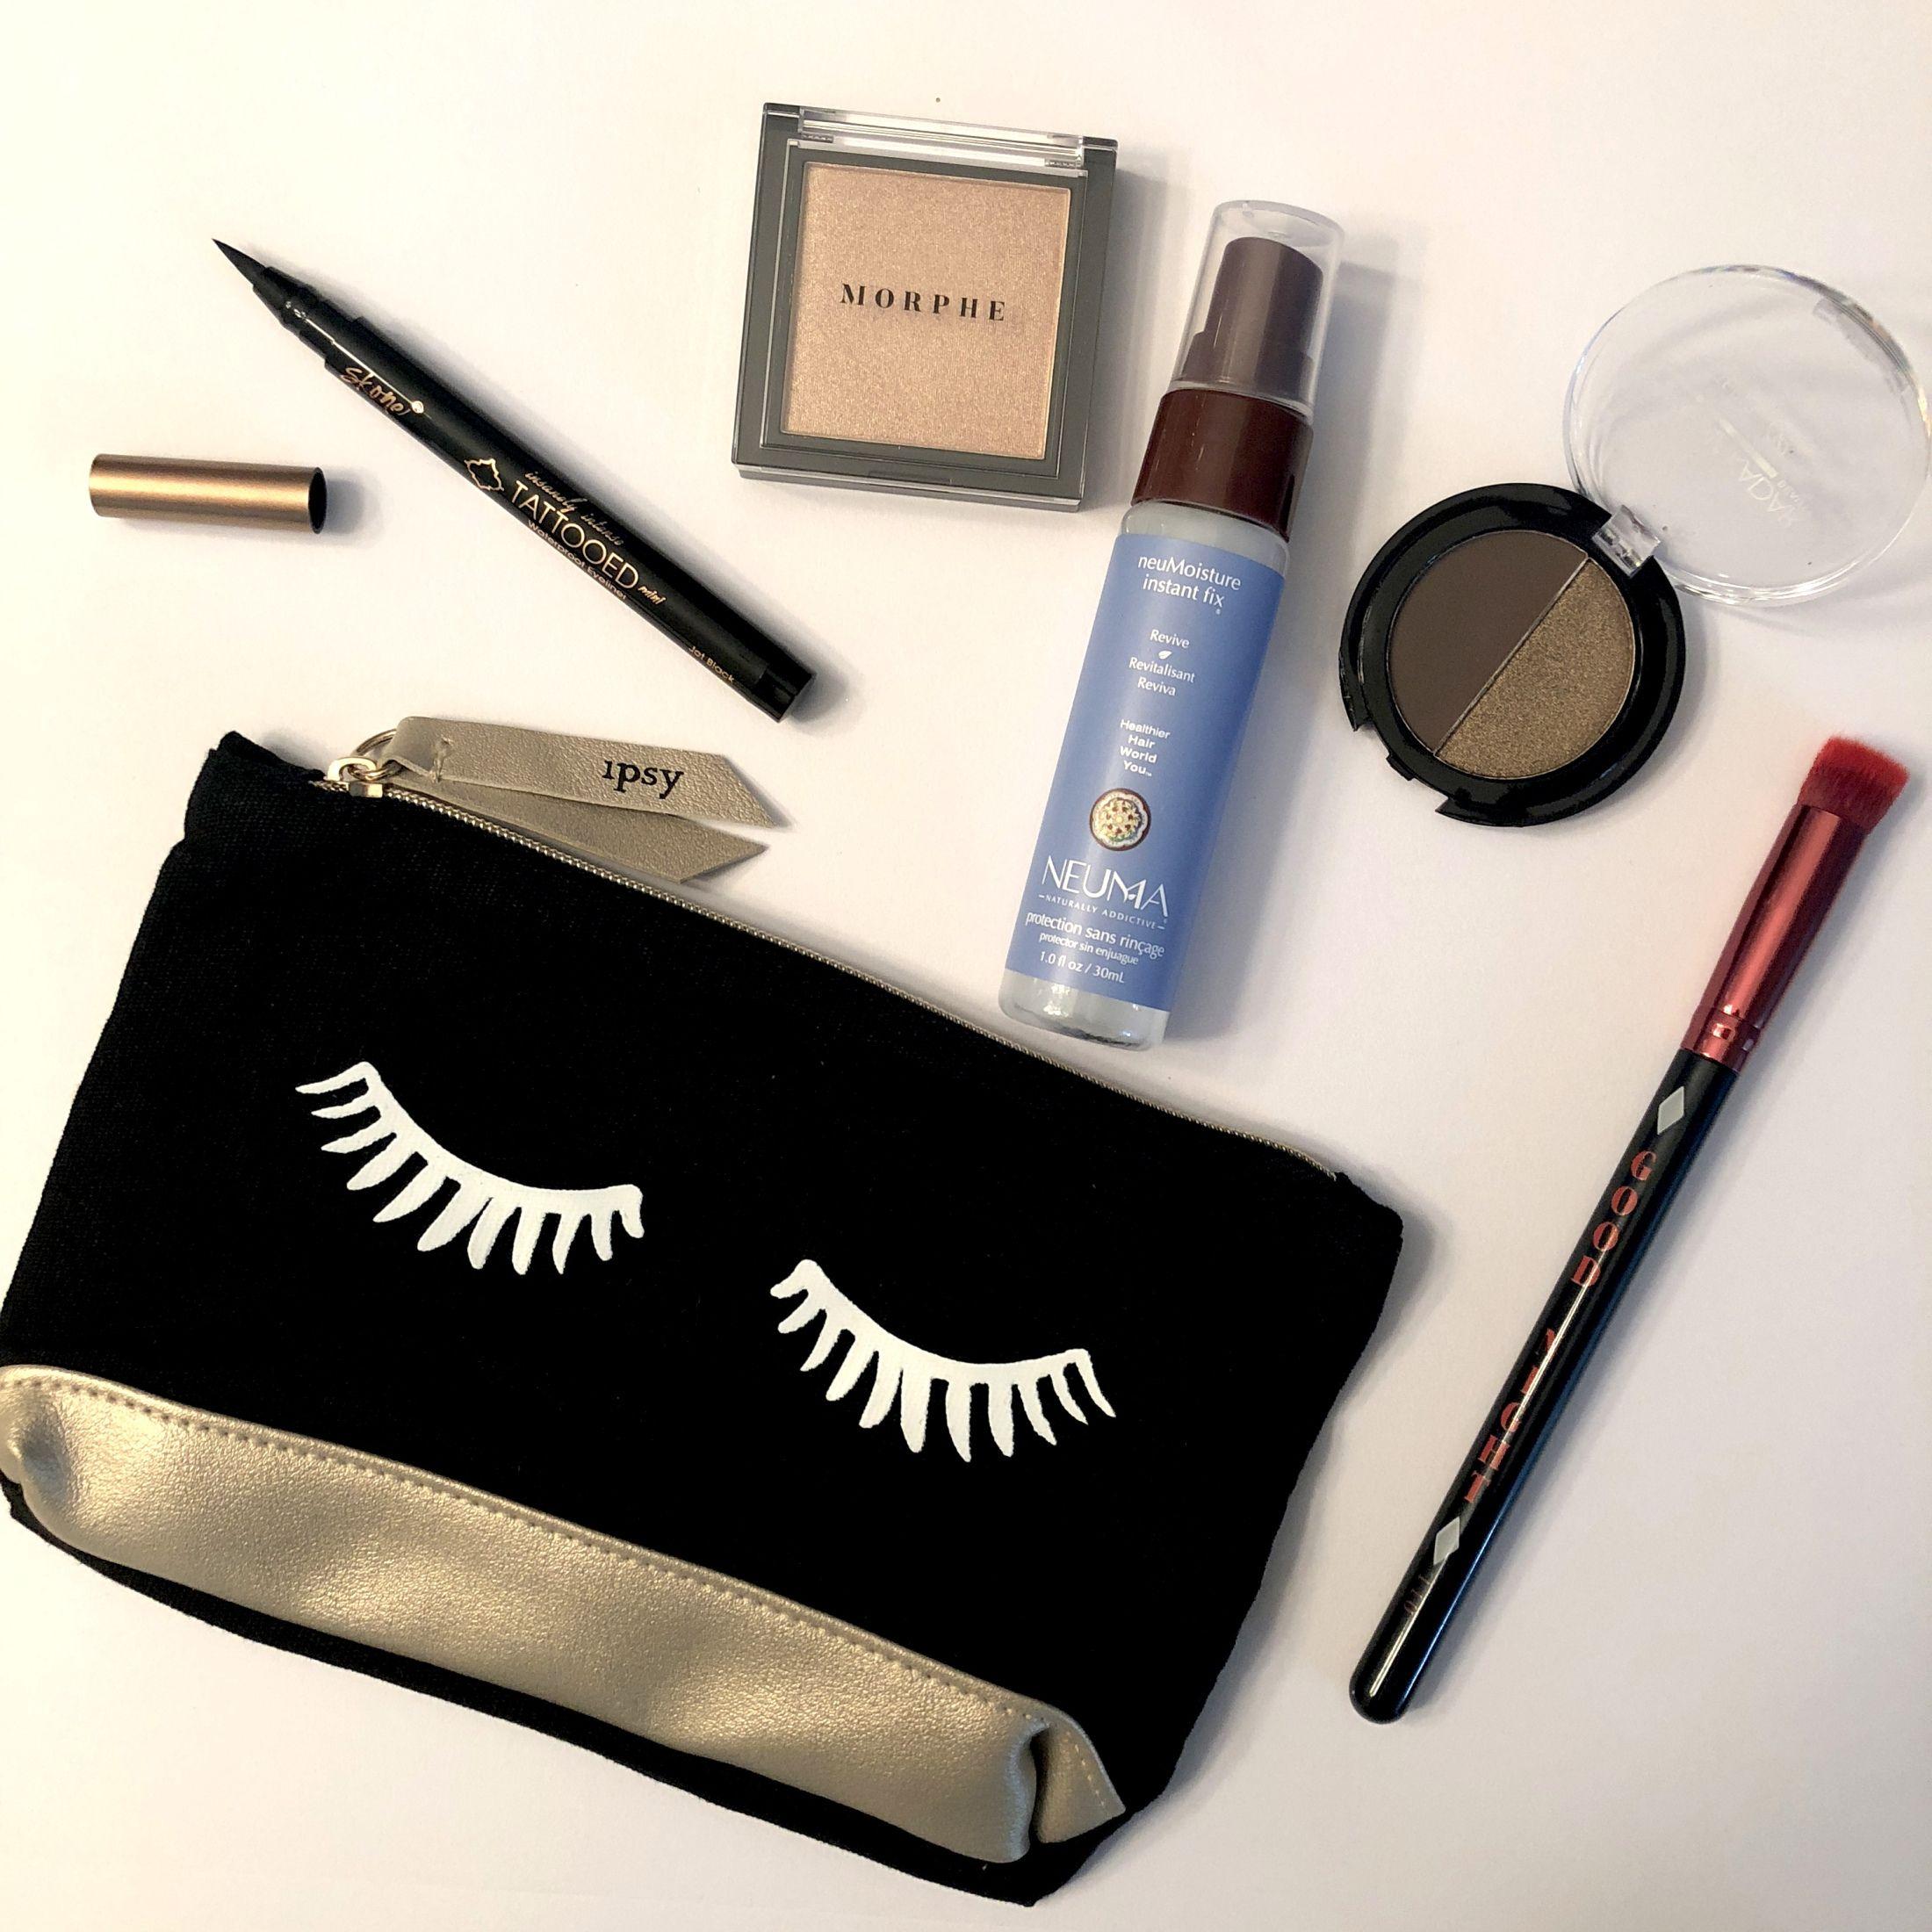 Ipsy Glam Bag 2018 Glam bag, Ipsy glam bag, Beauty box